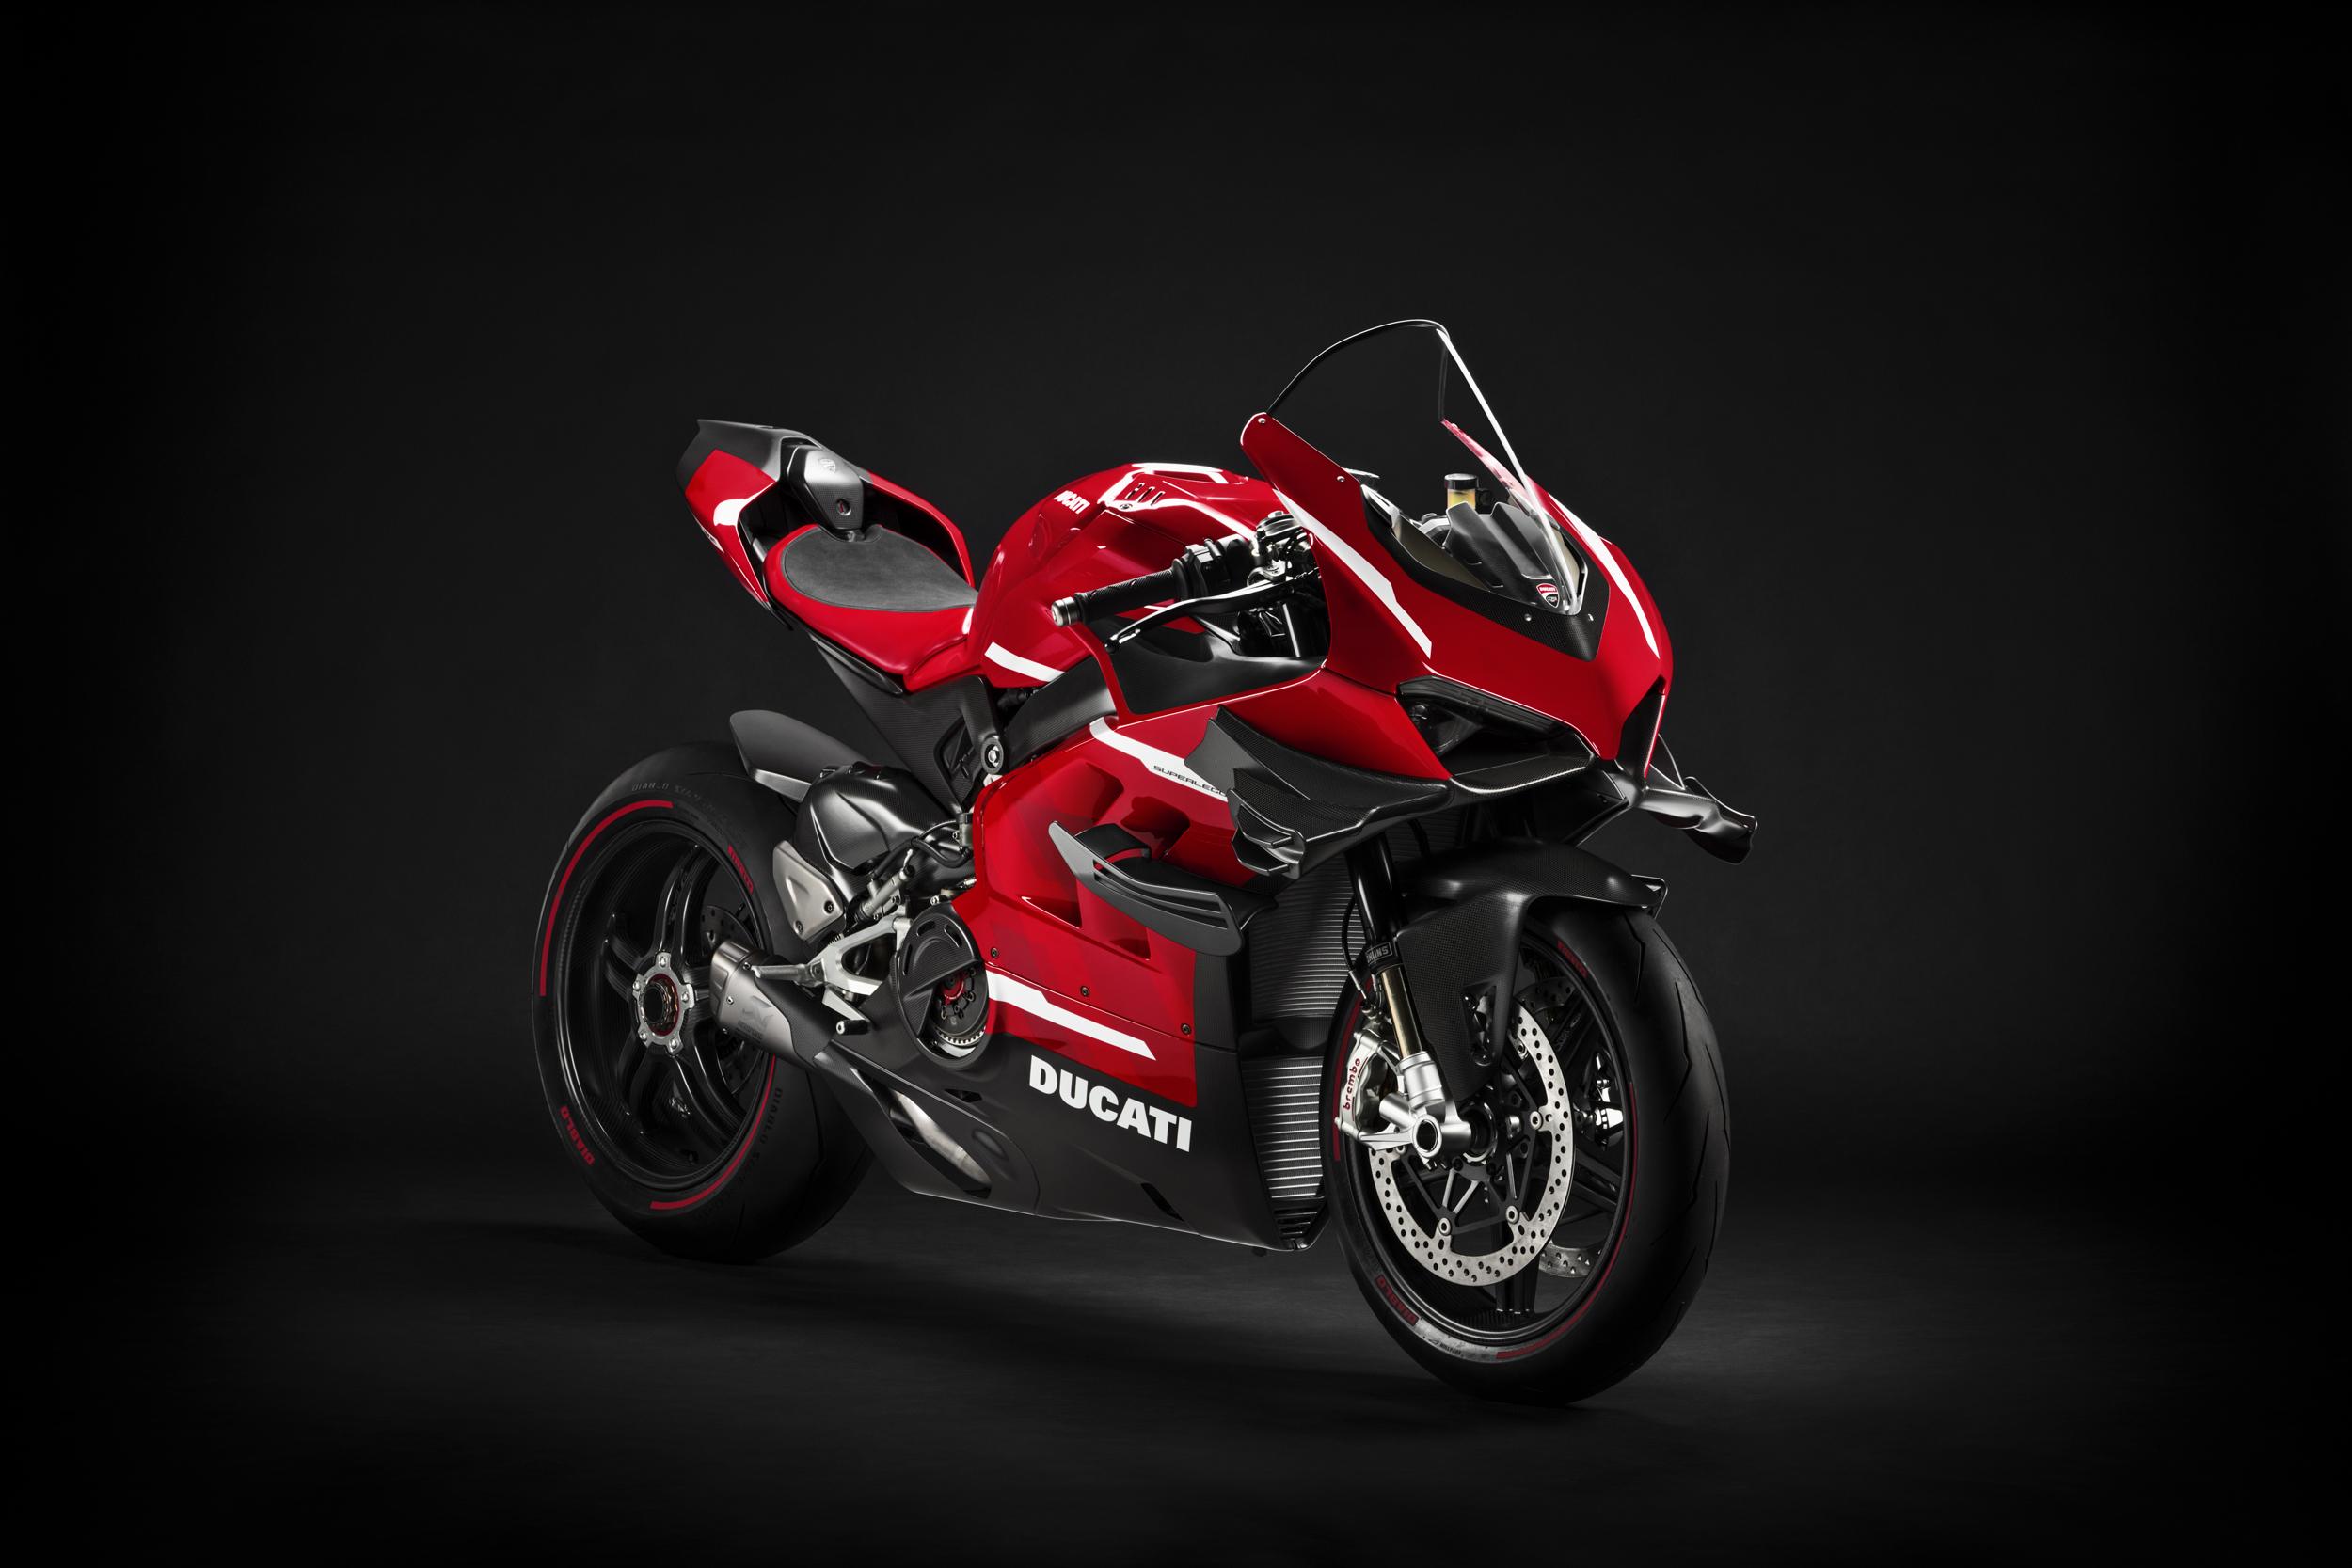 2020 Ducati Superleggera V4 [1]